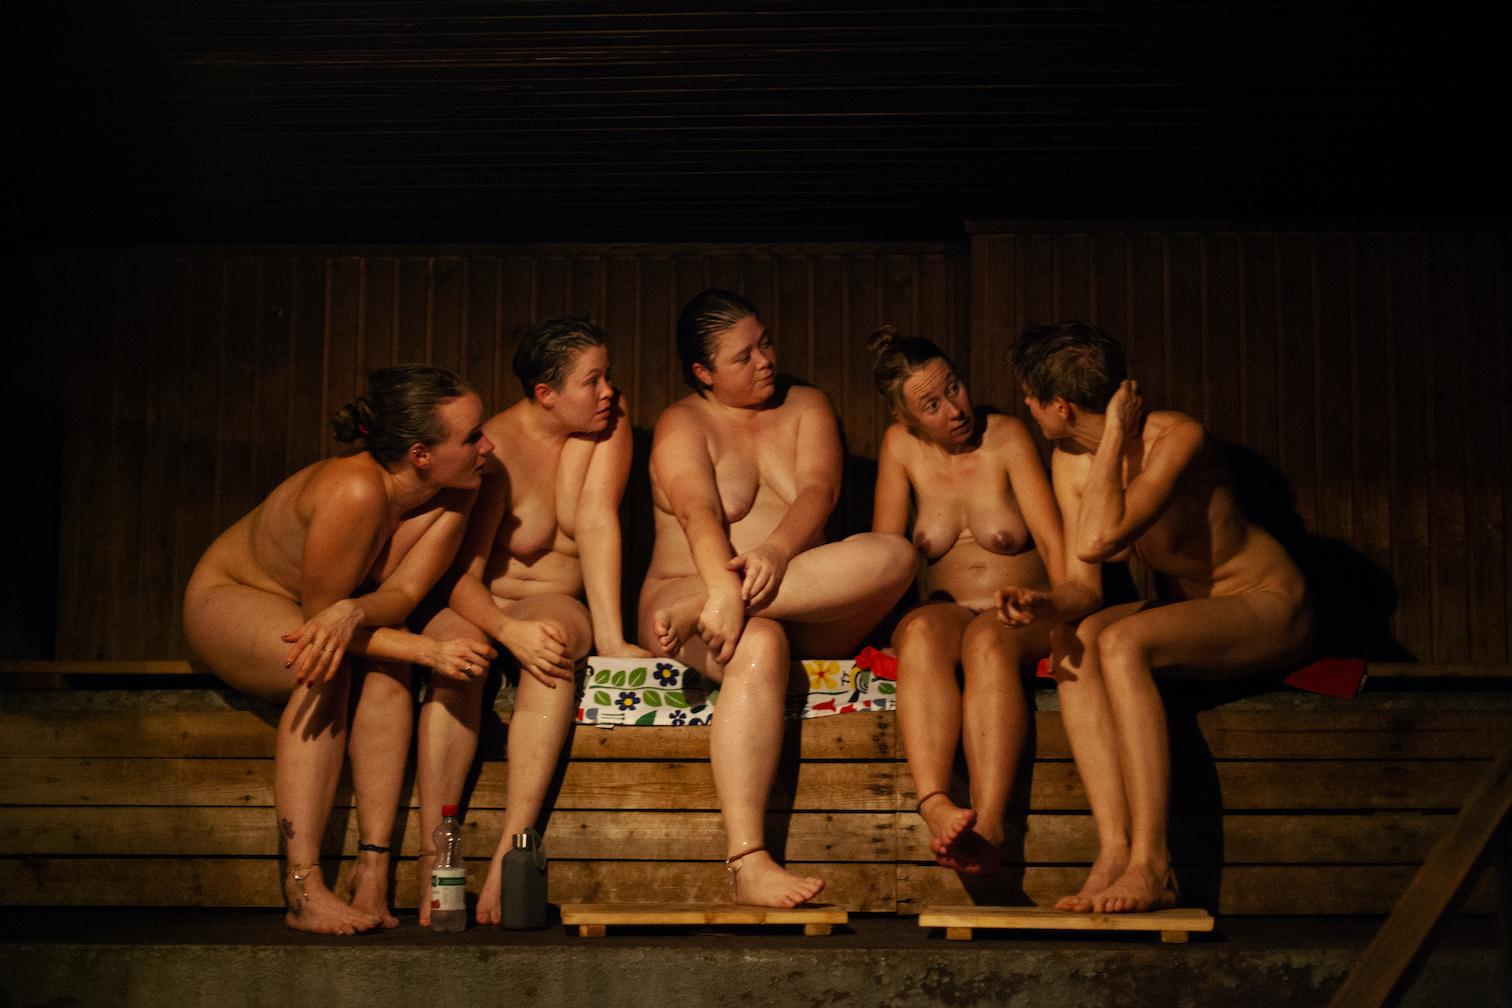 Heli Blåfield - Sauna People, a documentary look at Finnish modern-day sauna culture.